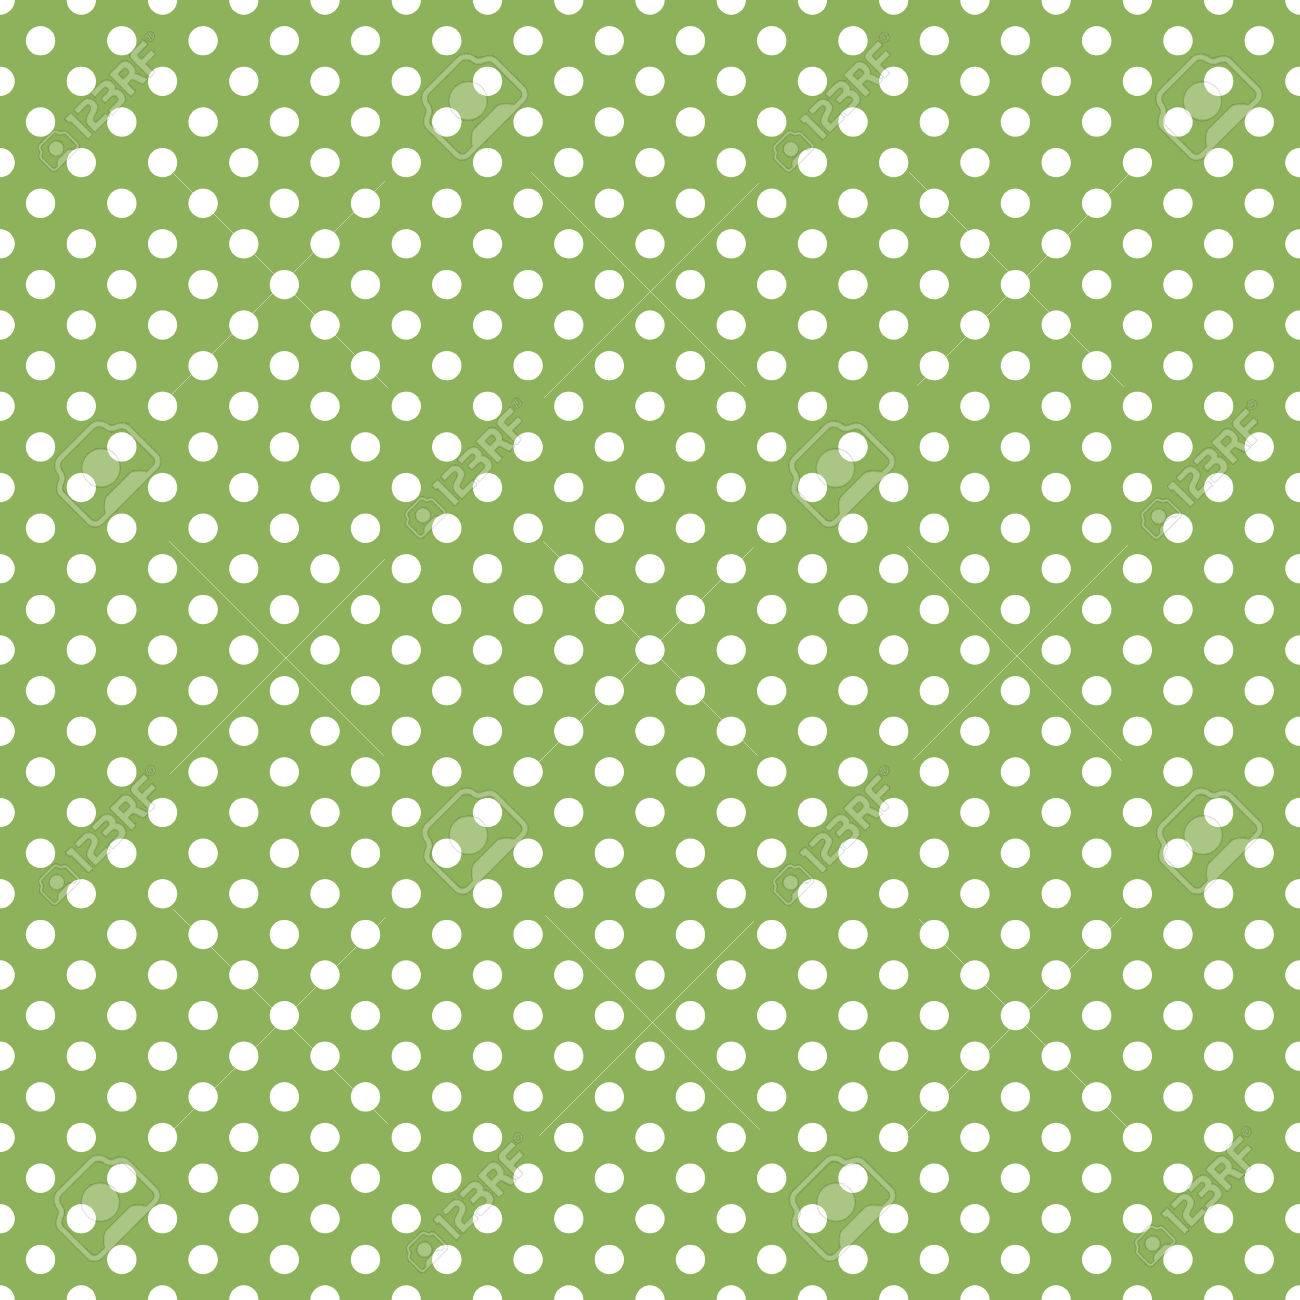 Seamless Green Polka Dot Background Royalty Free Cliparts Vectors